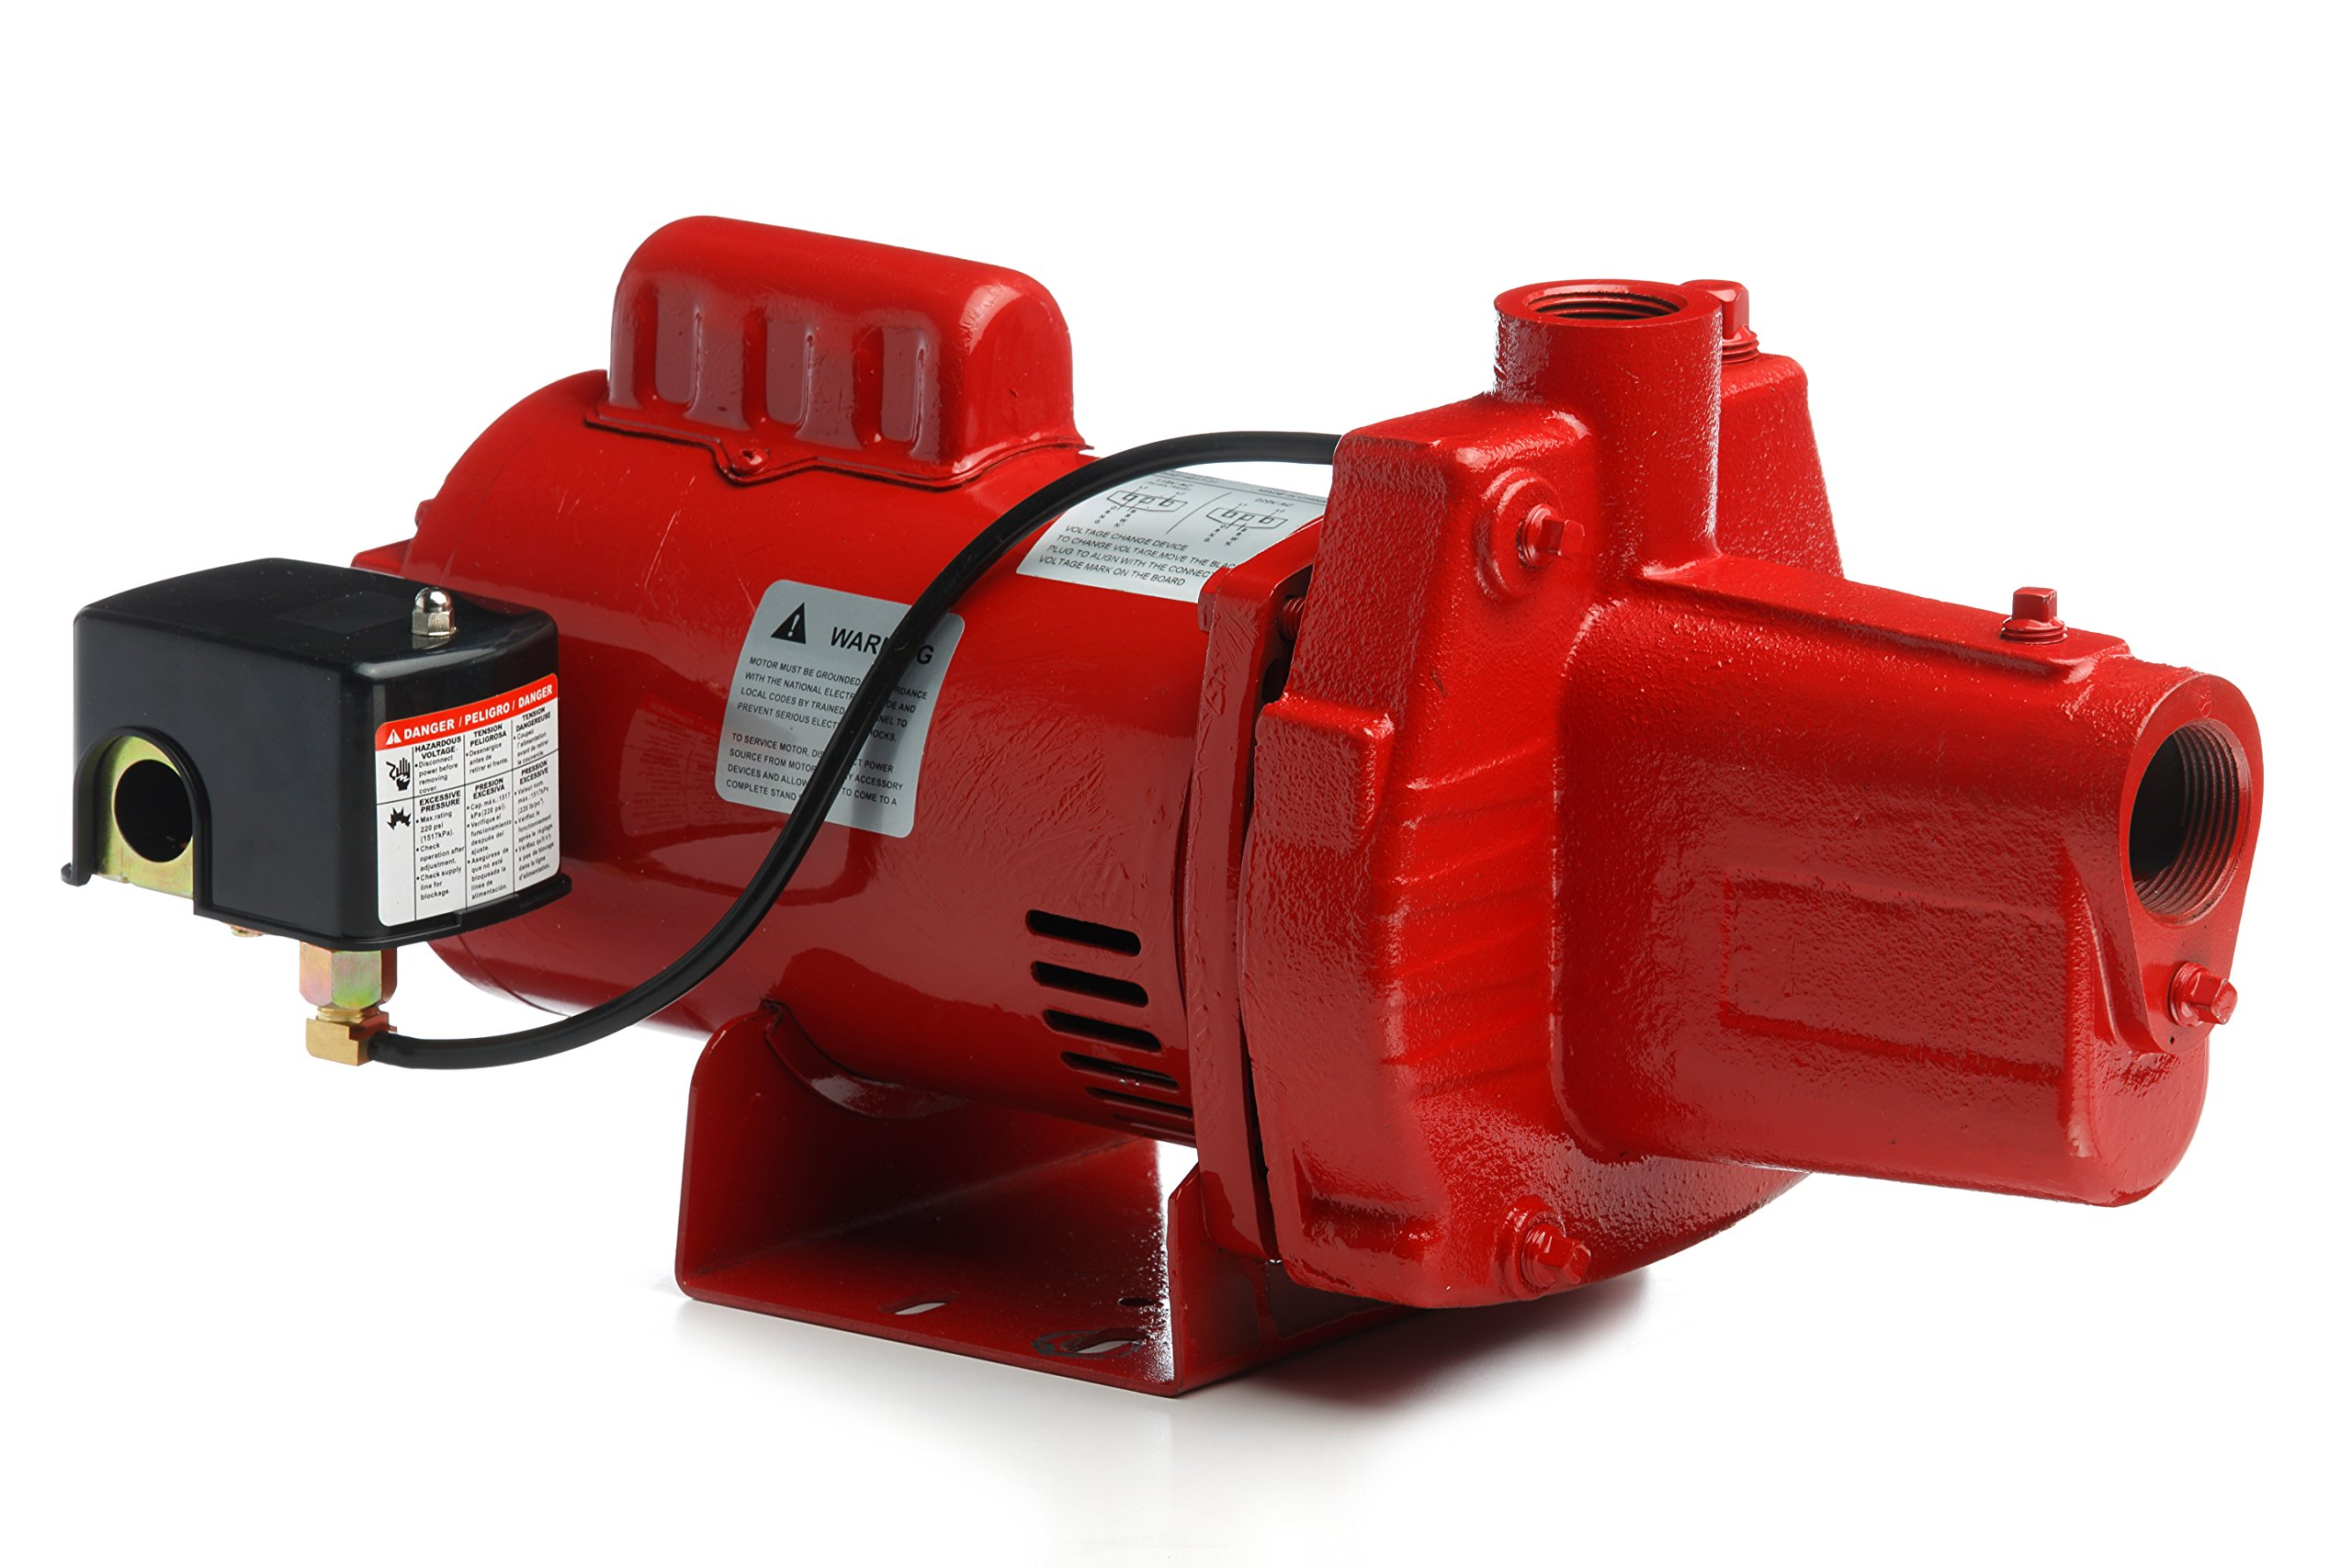 Red Lion RJS-50-PREM 602206 Premium Cast Iron Shallow Well Jet Pump by Red Lion